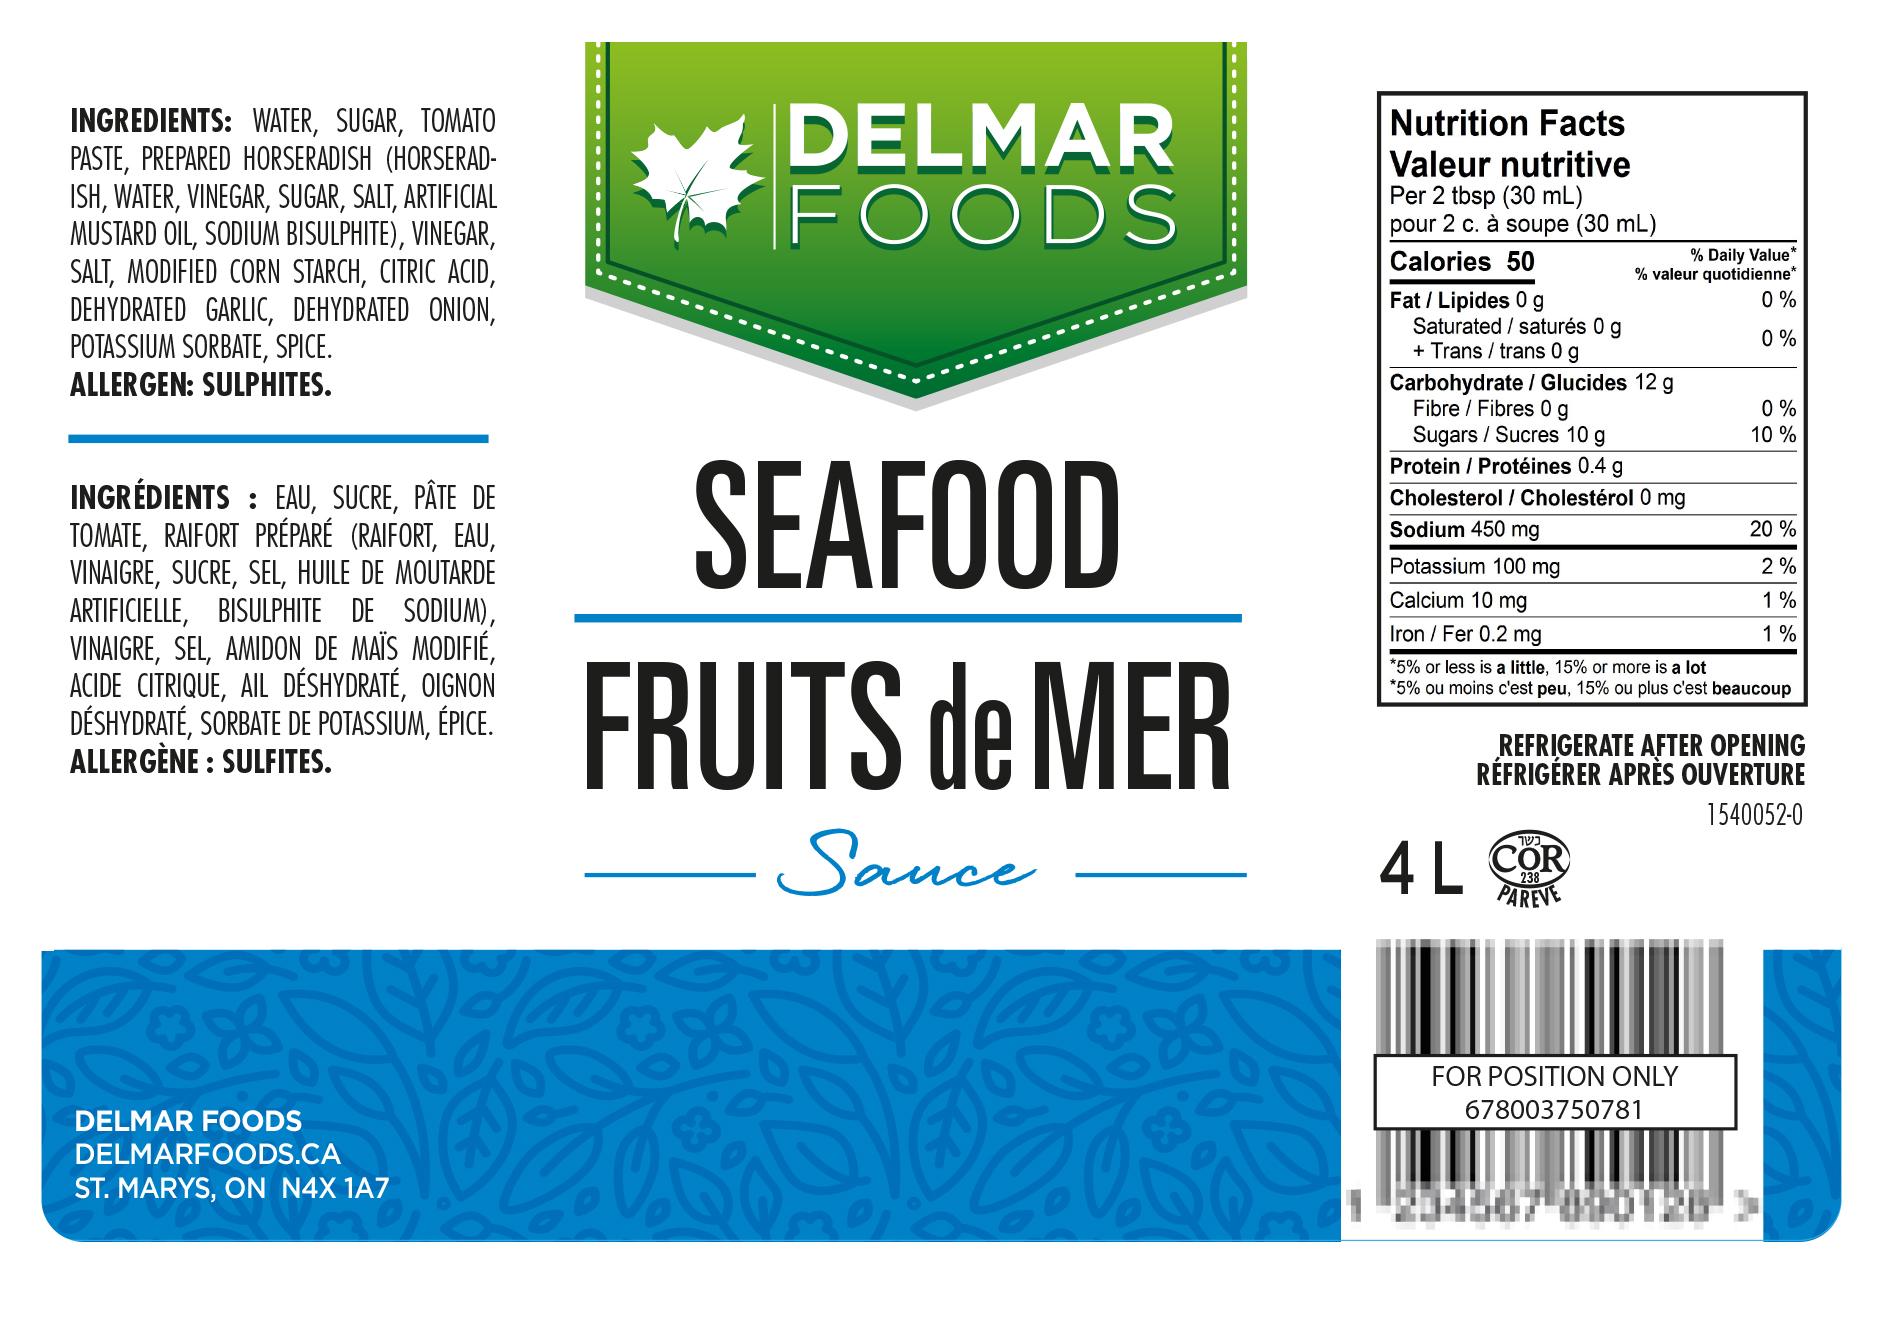 DelmarFds_Seafood.jpg